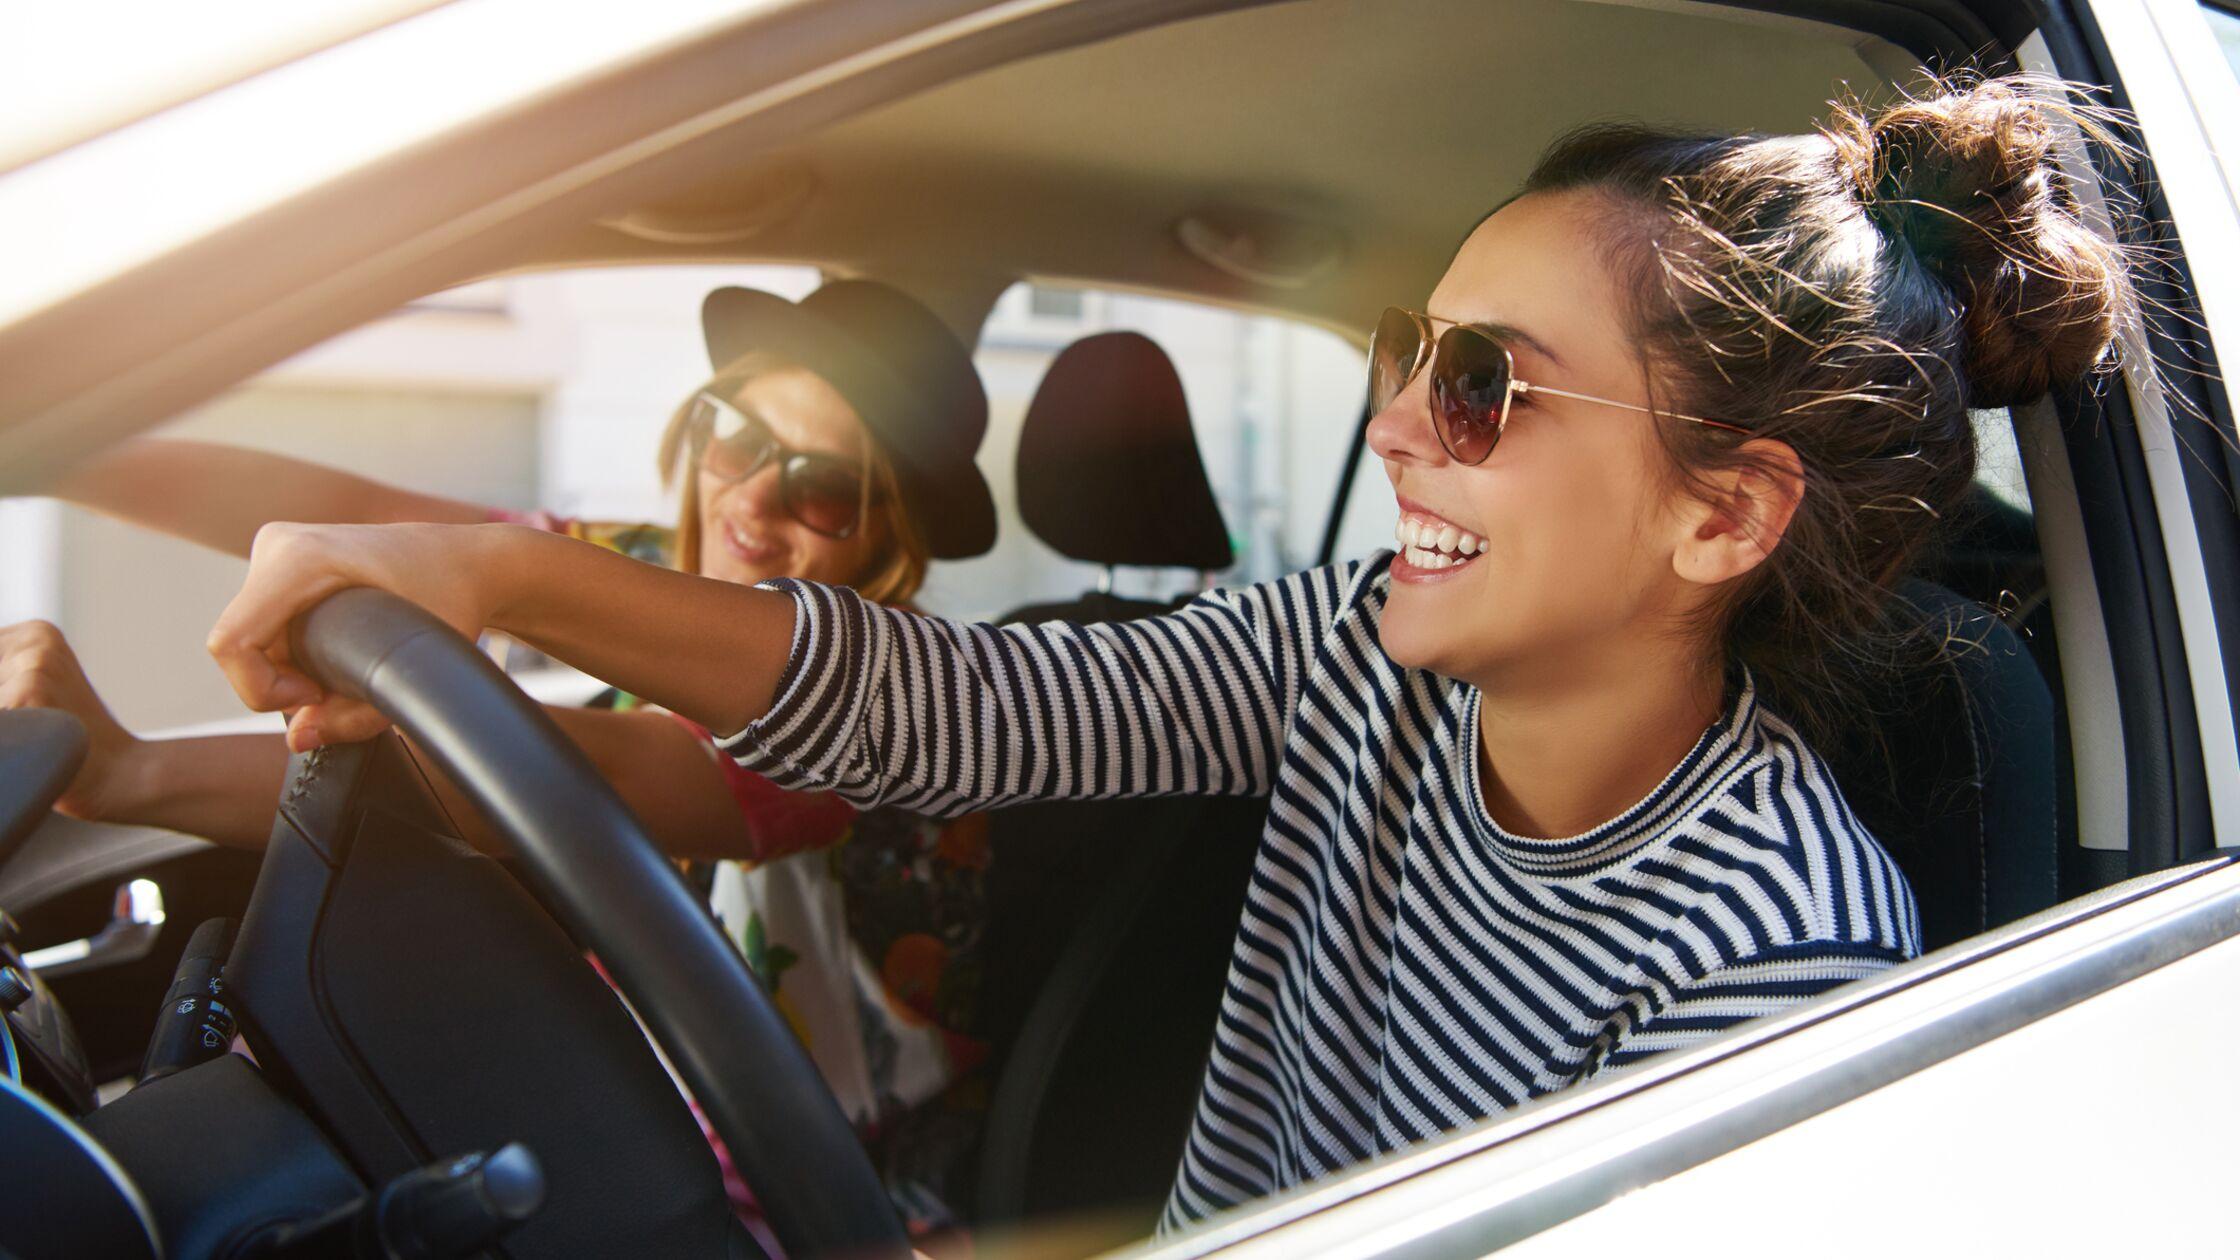 Zwei gut gelaunte Frauen fahren im Auto.